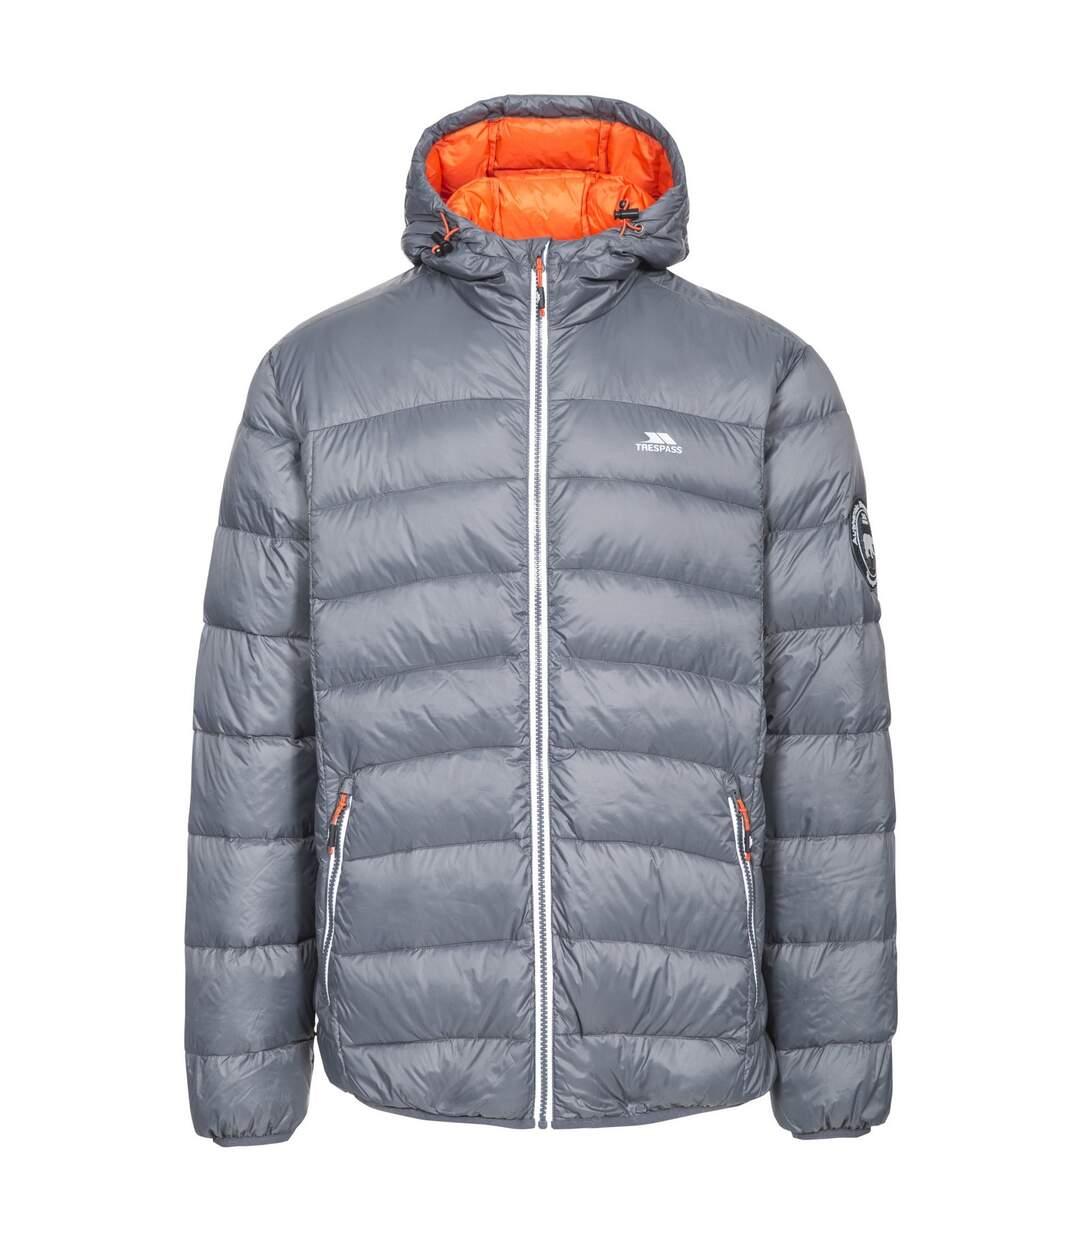 Trespass Mens Whitman Packaway Down Jacket (Carbon/Hot Orange) - UTTP3569